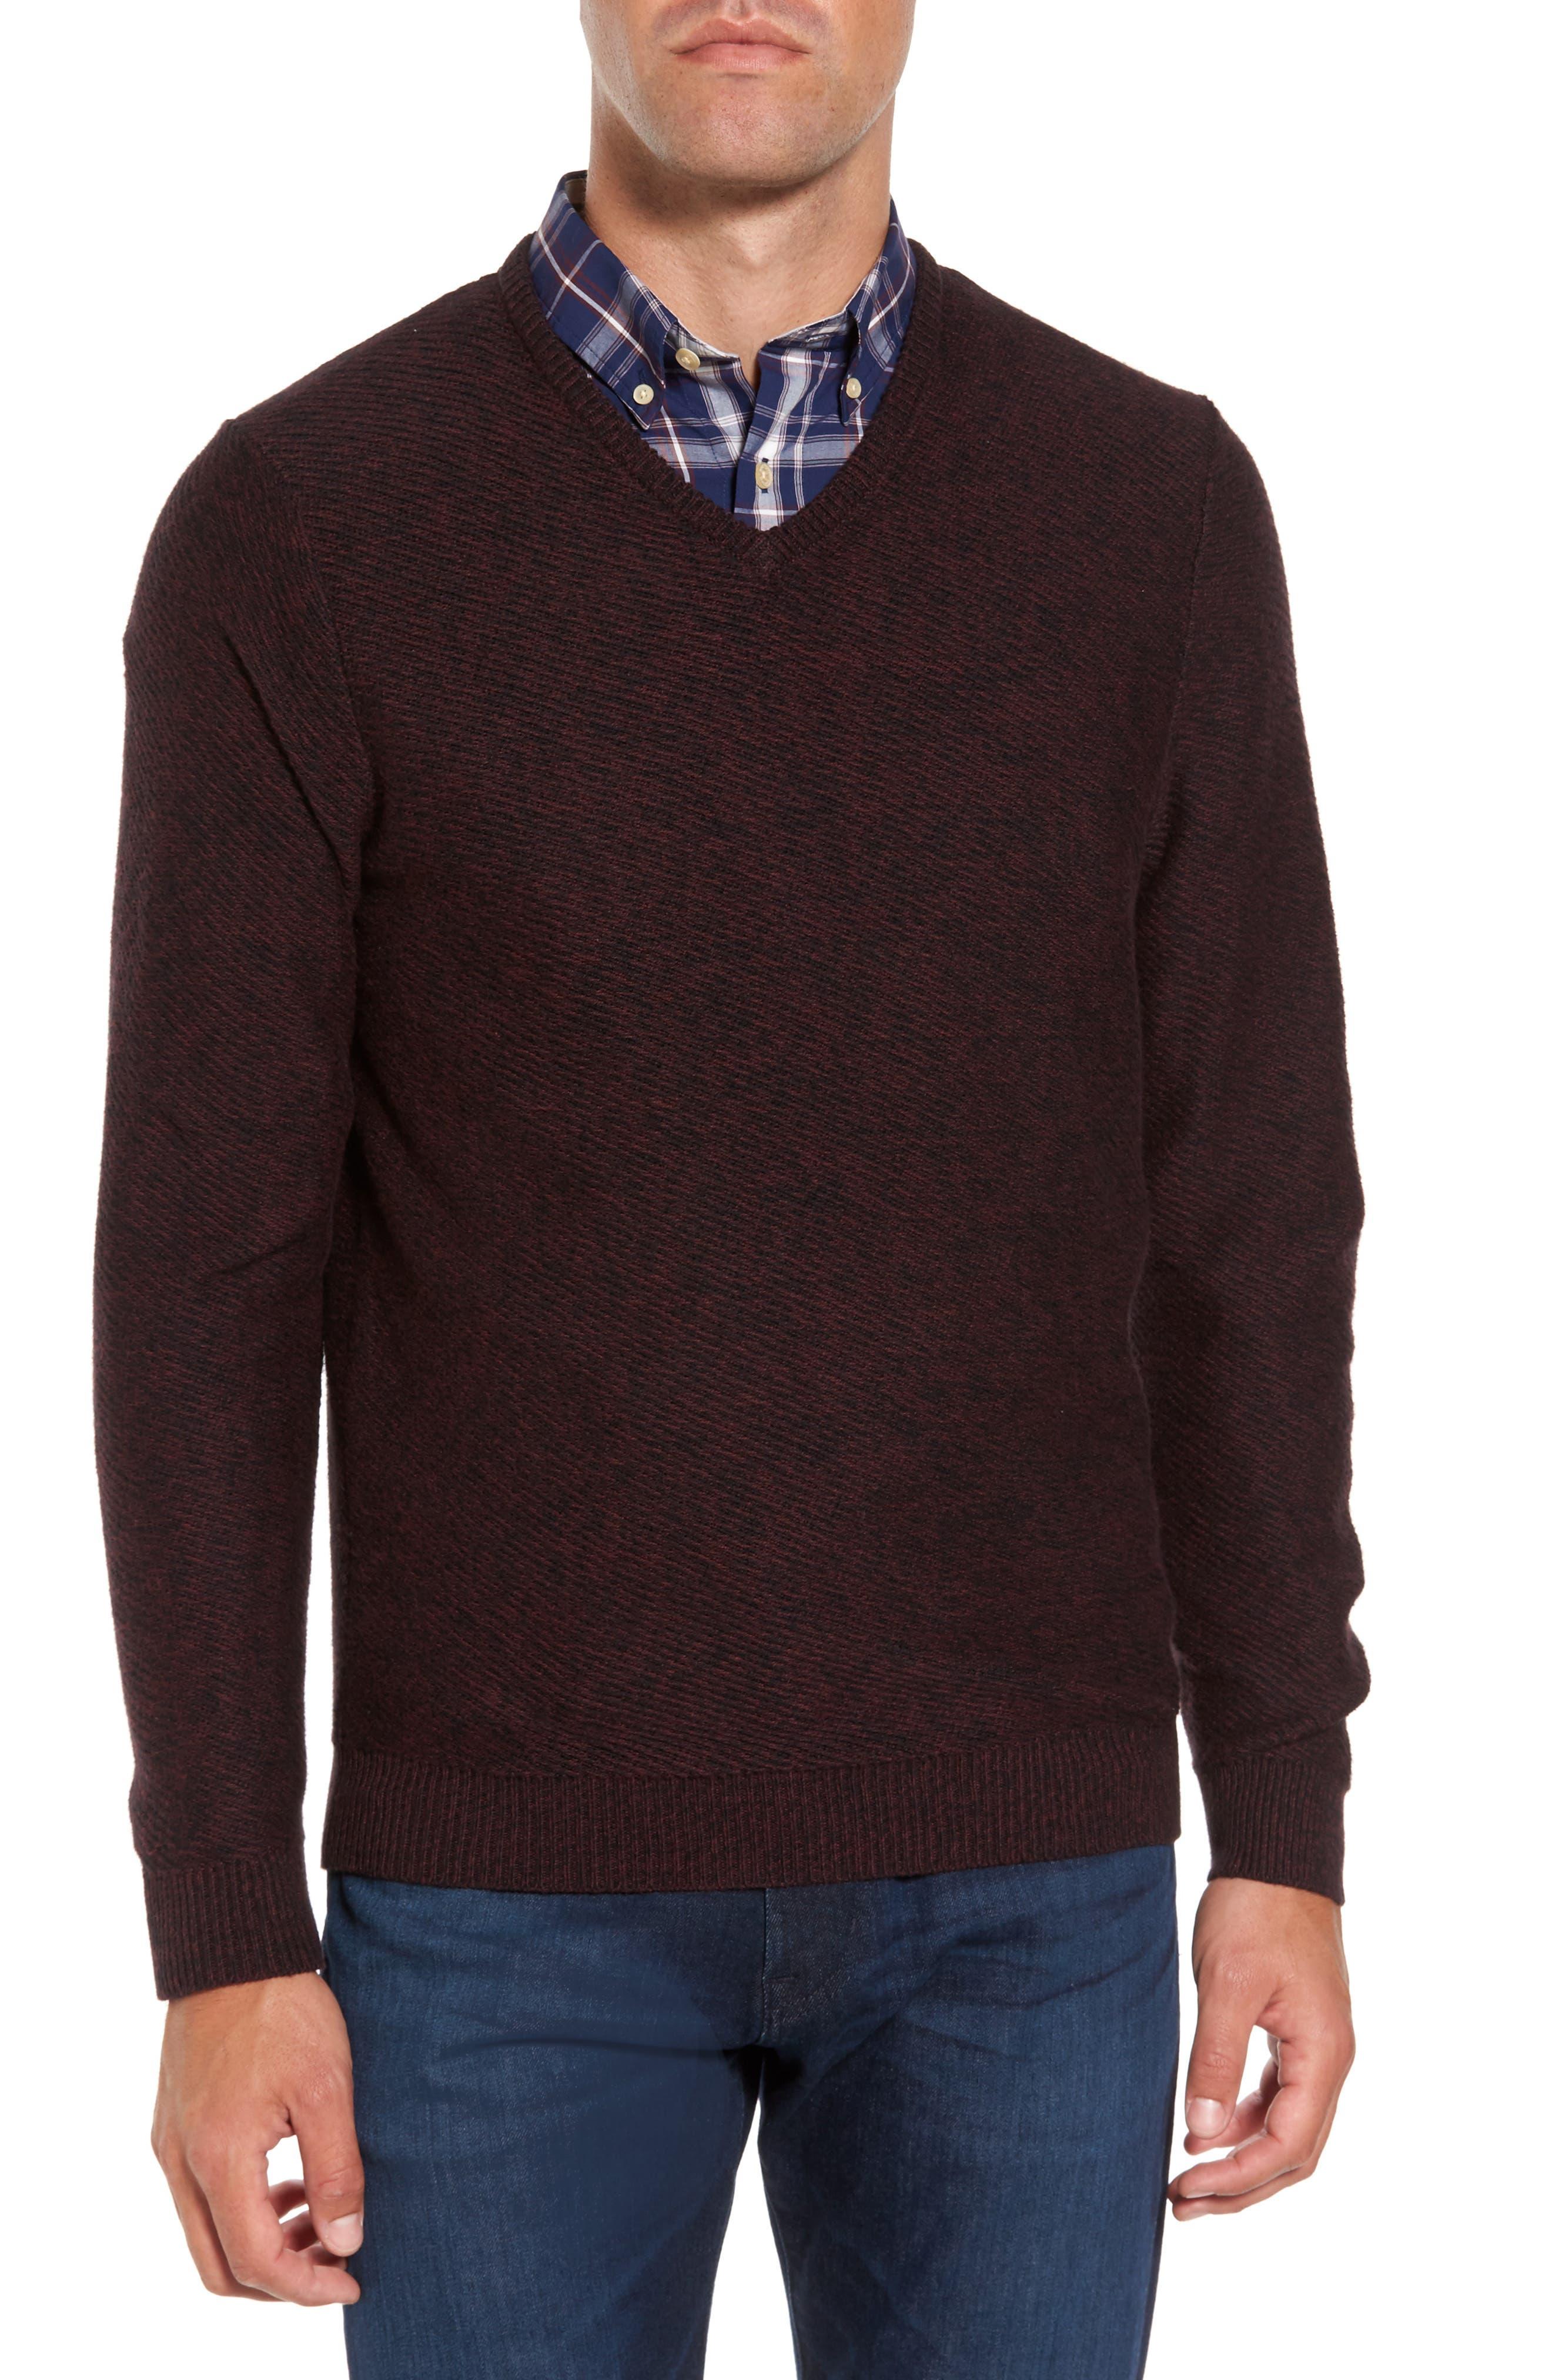 Main Image - Nordstrom Men's Shop Cotton & Cashmere V-Neck Sweater